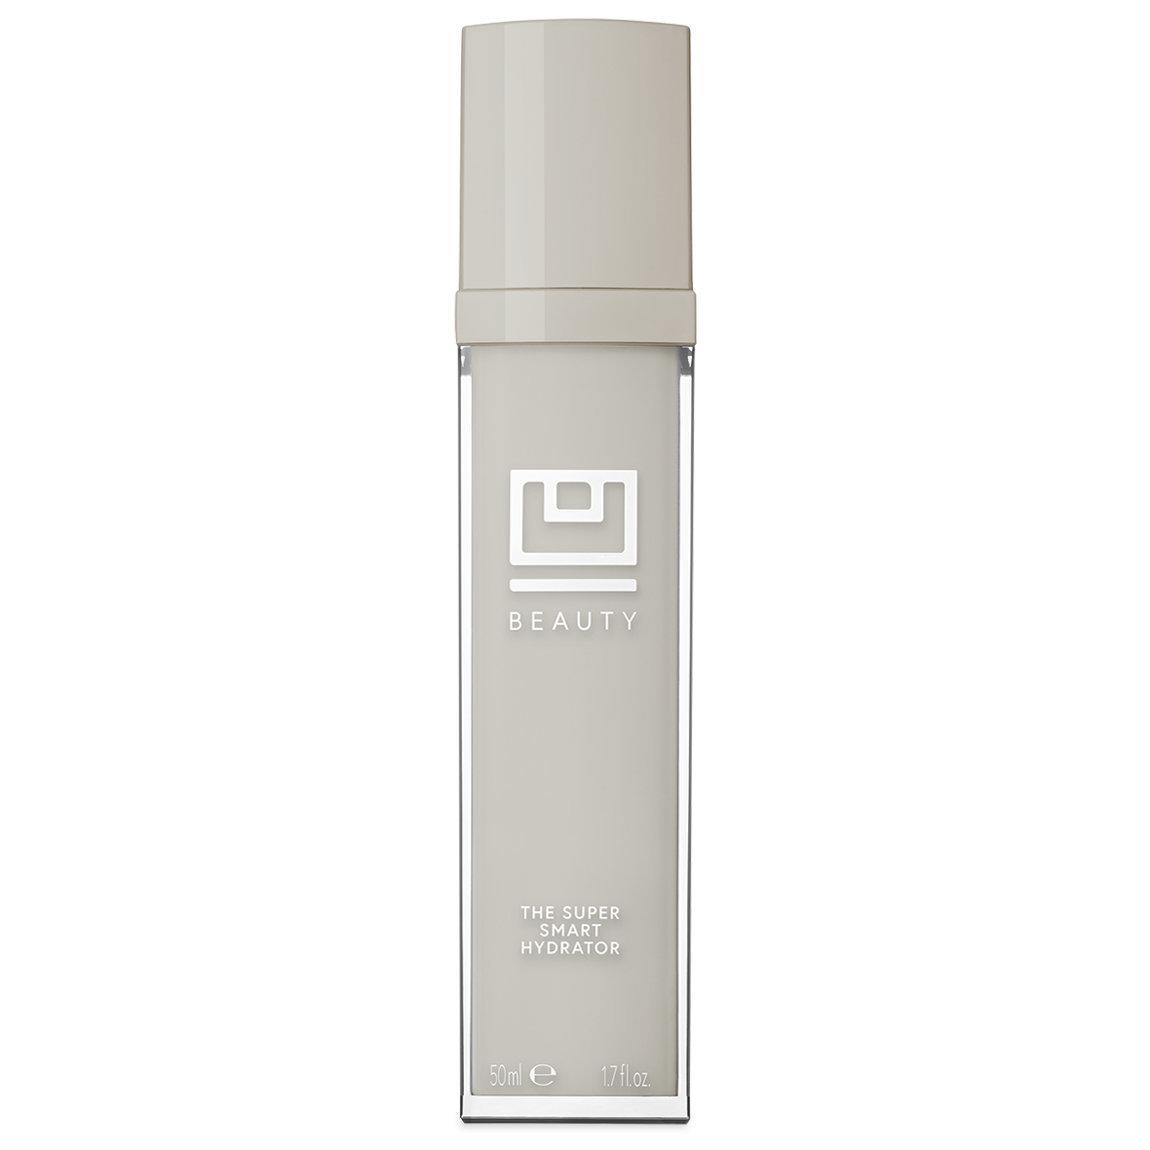 U Beauty SUPER Smart Hydrator 50 ml alternative view 1 - product swatch.